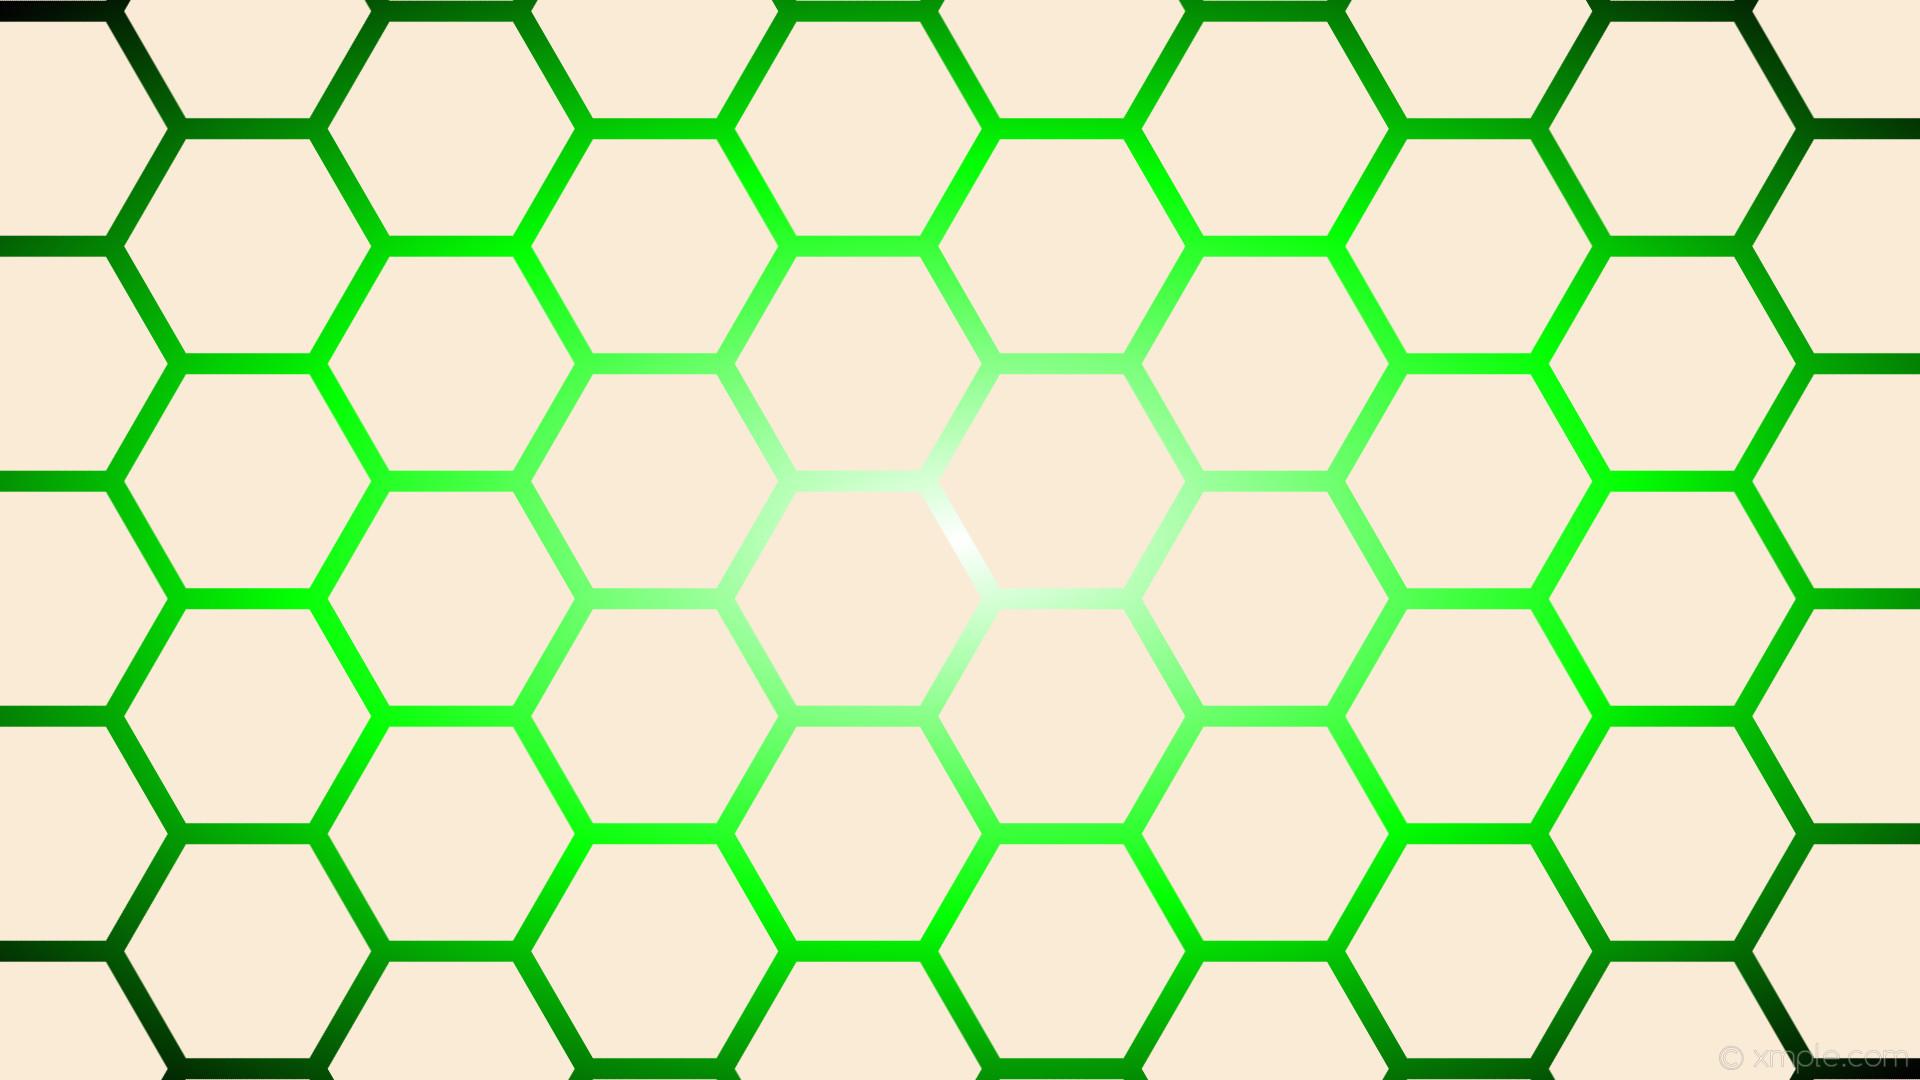 wallpaper glow green white gradient hexagon black antique white lime  #faebd7 #ffffff #00ff00